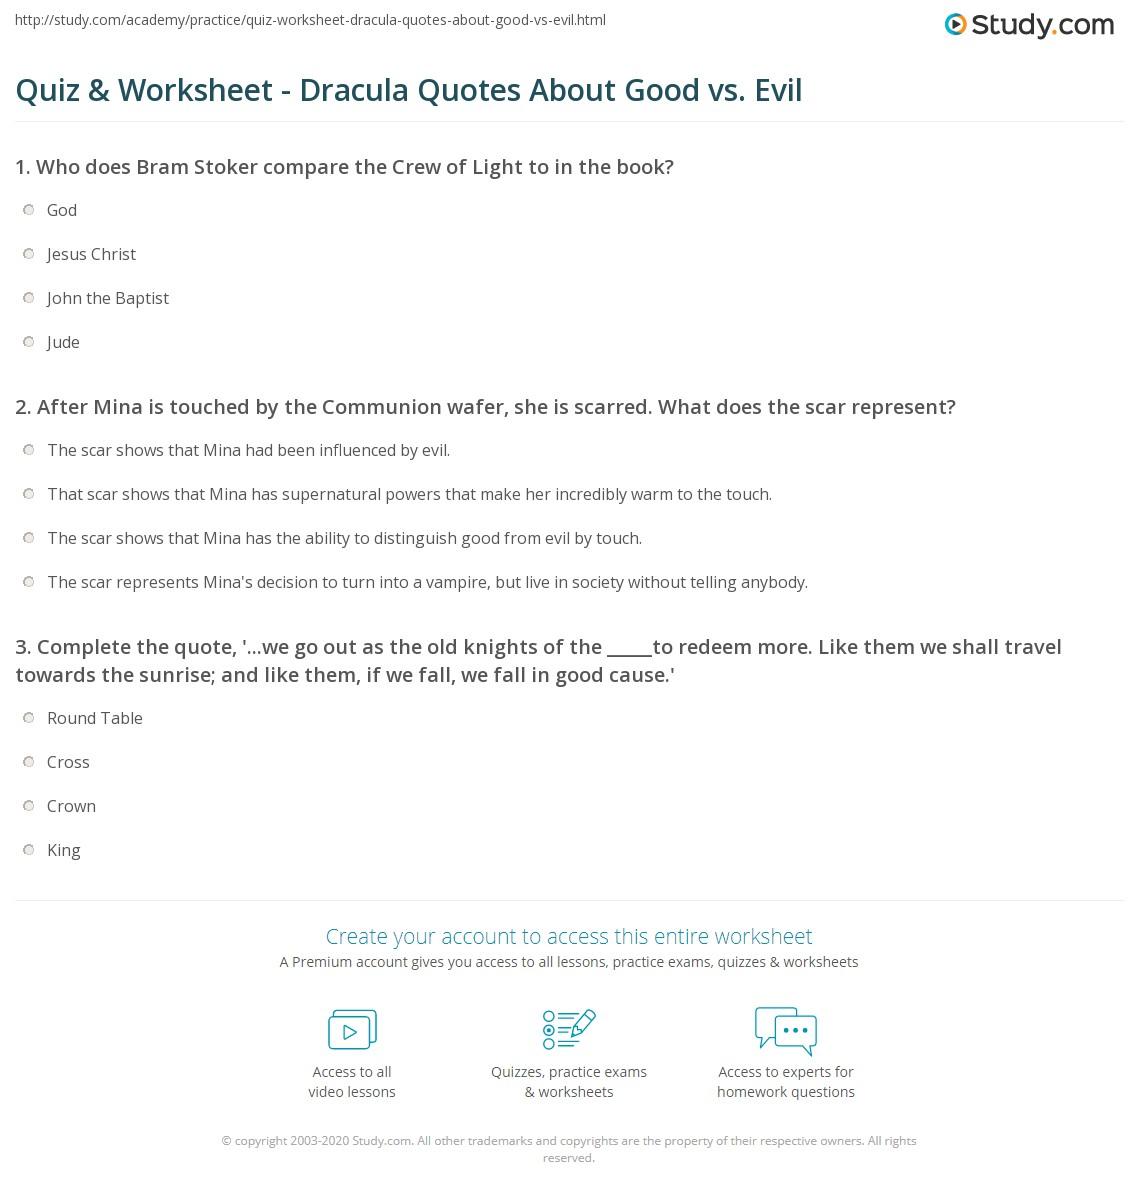 Quiz Worksheet Dracula Quotes About Good Vs Evil Studycom